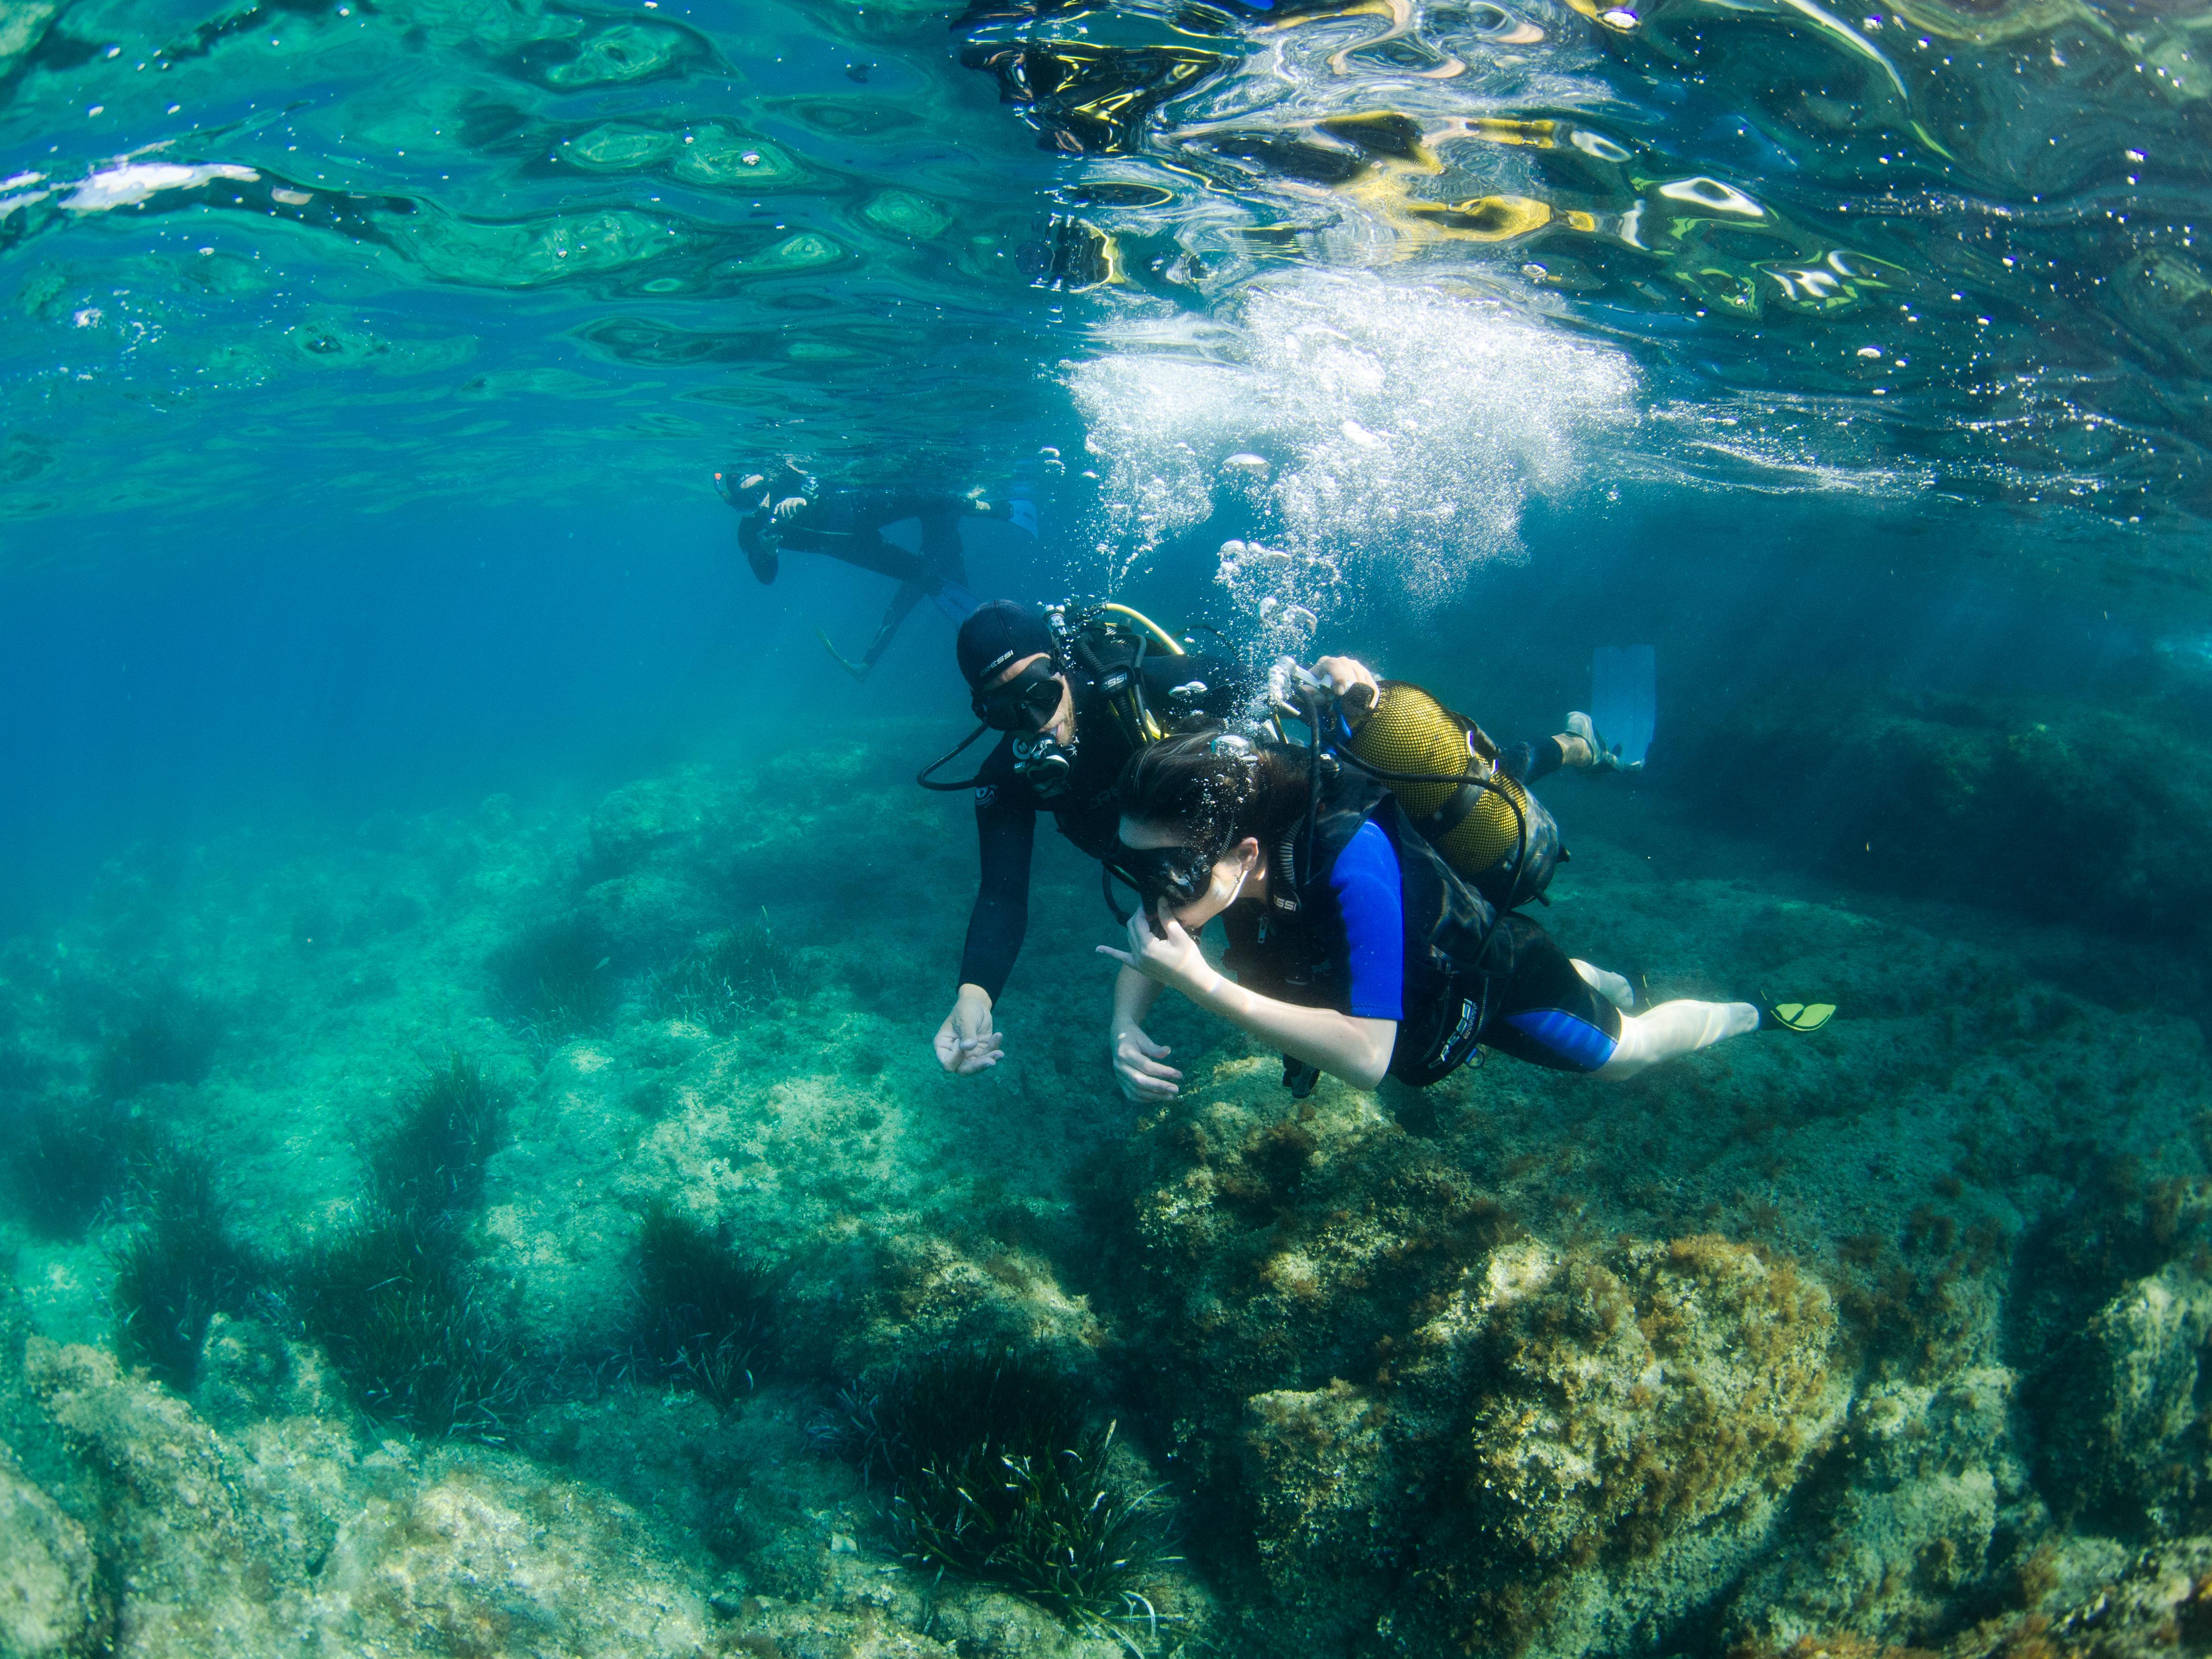 club d eplongée sous marine nice